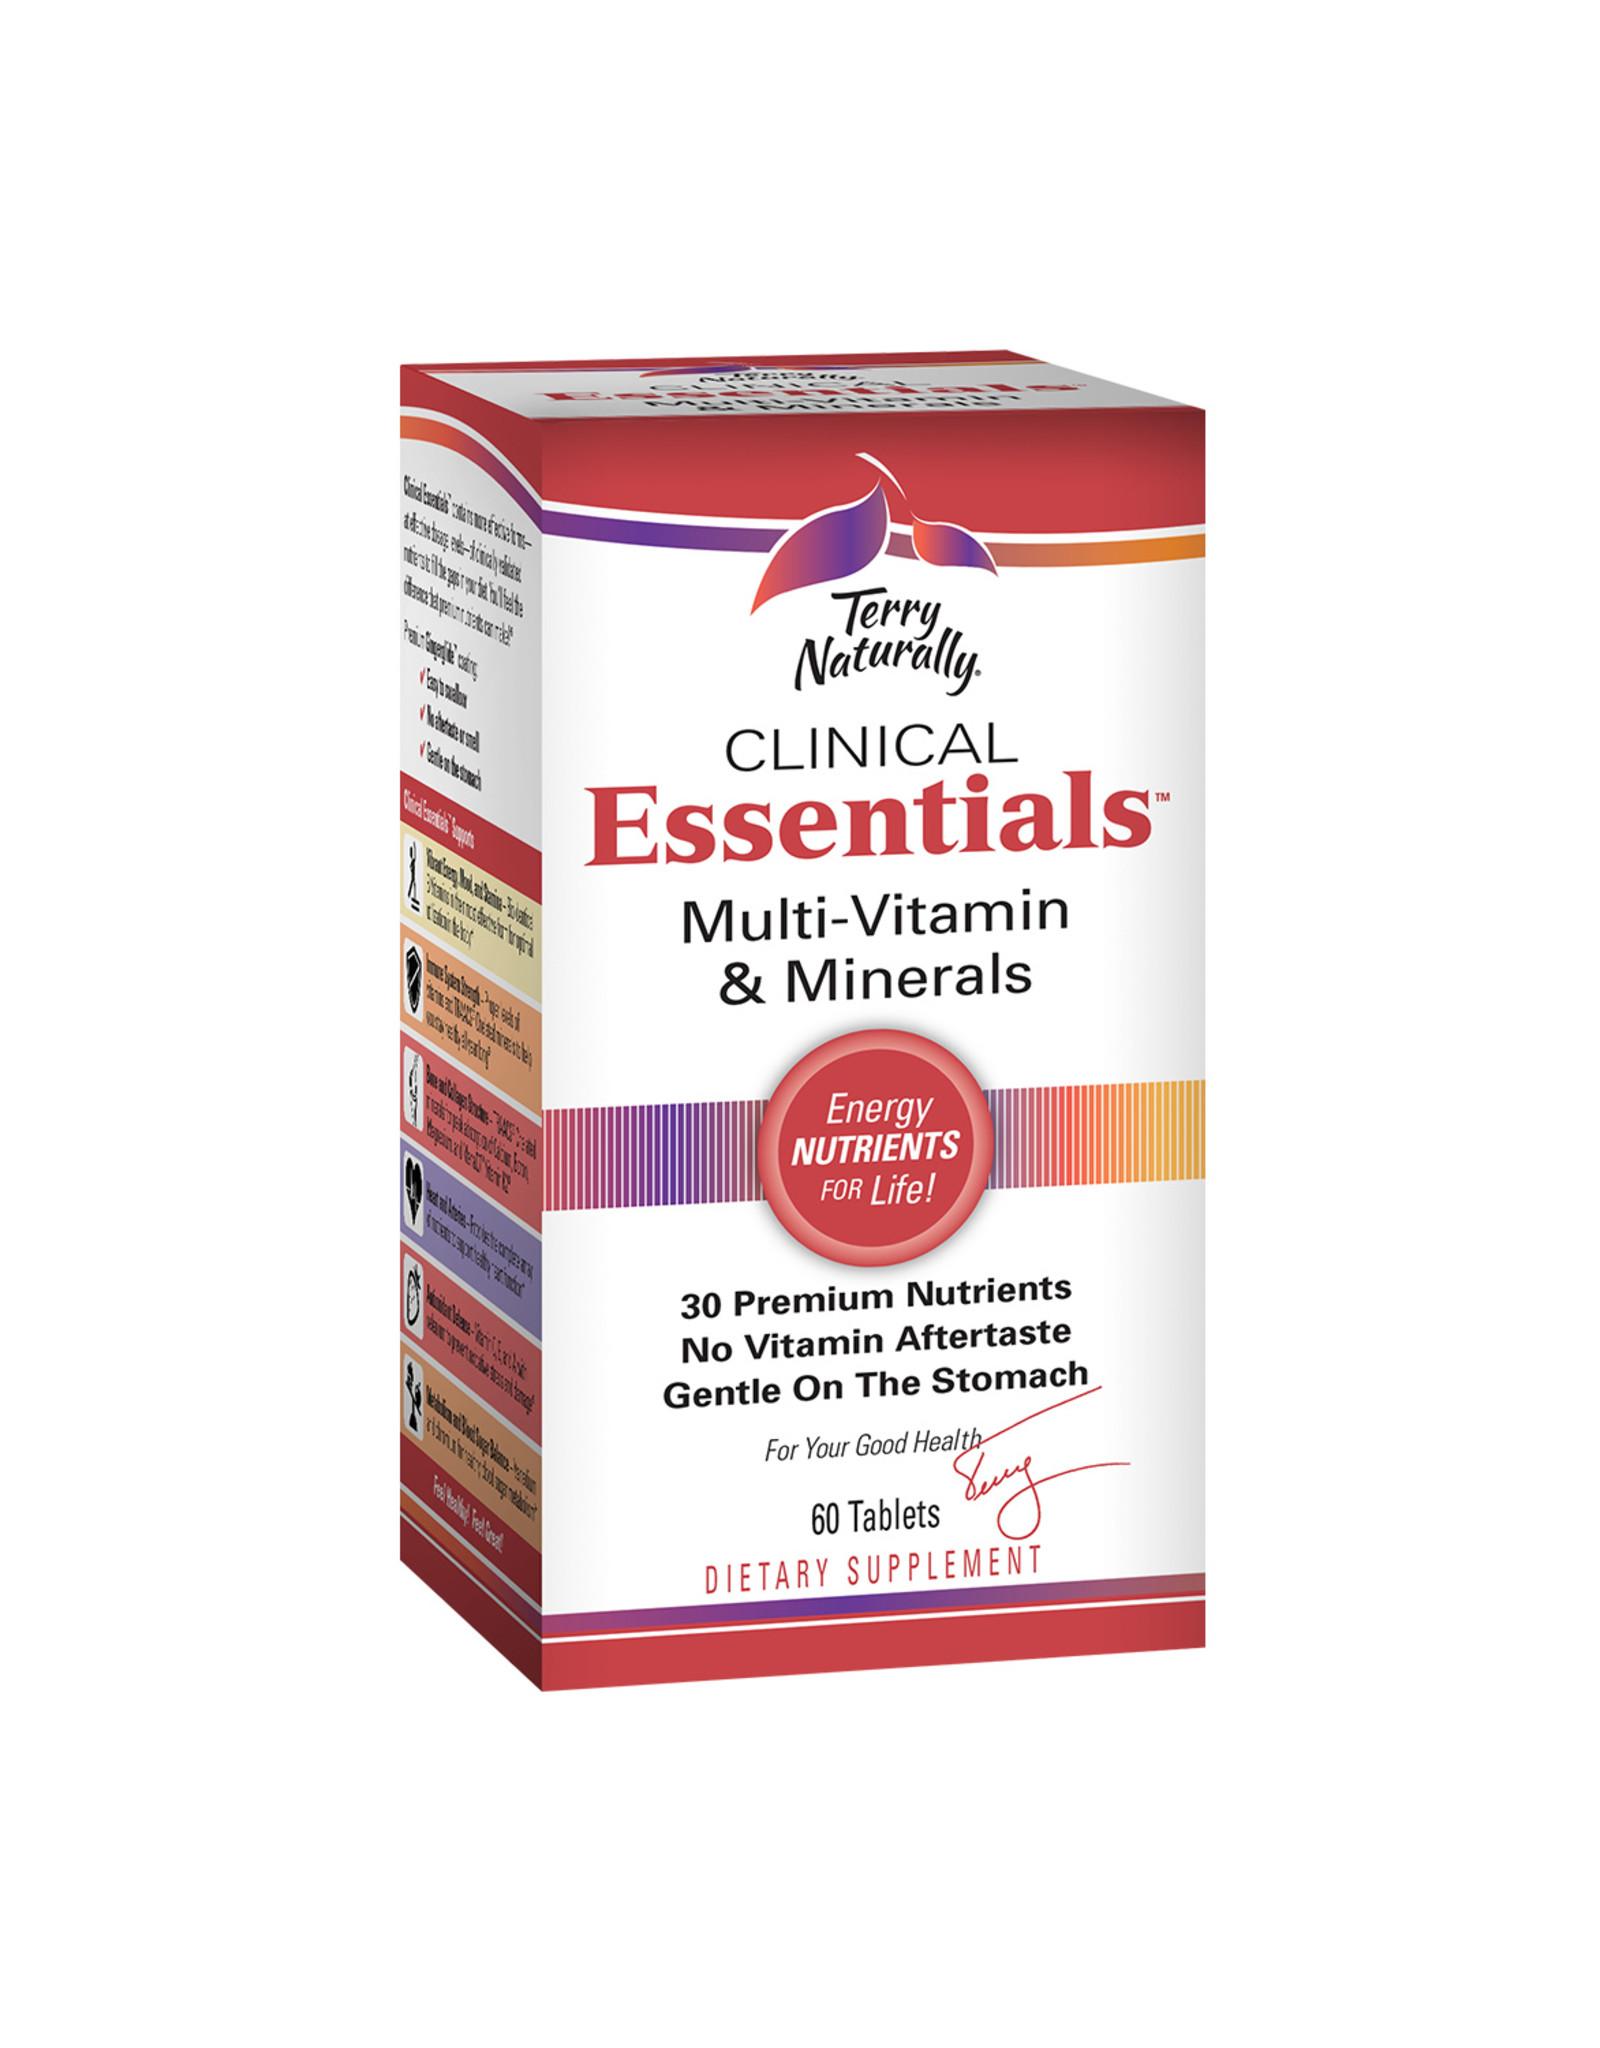 EuroPharma Clinical Essentials Multi-Vitamin & Minerals 60ct